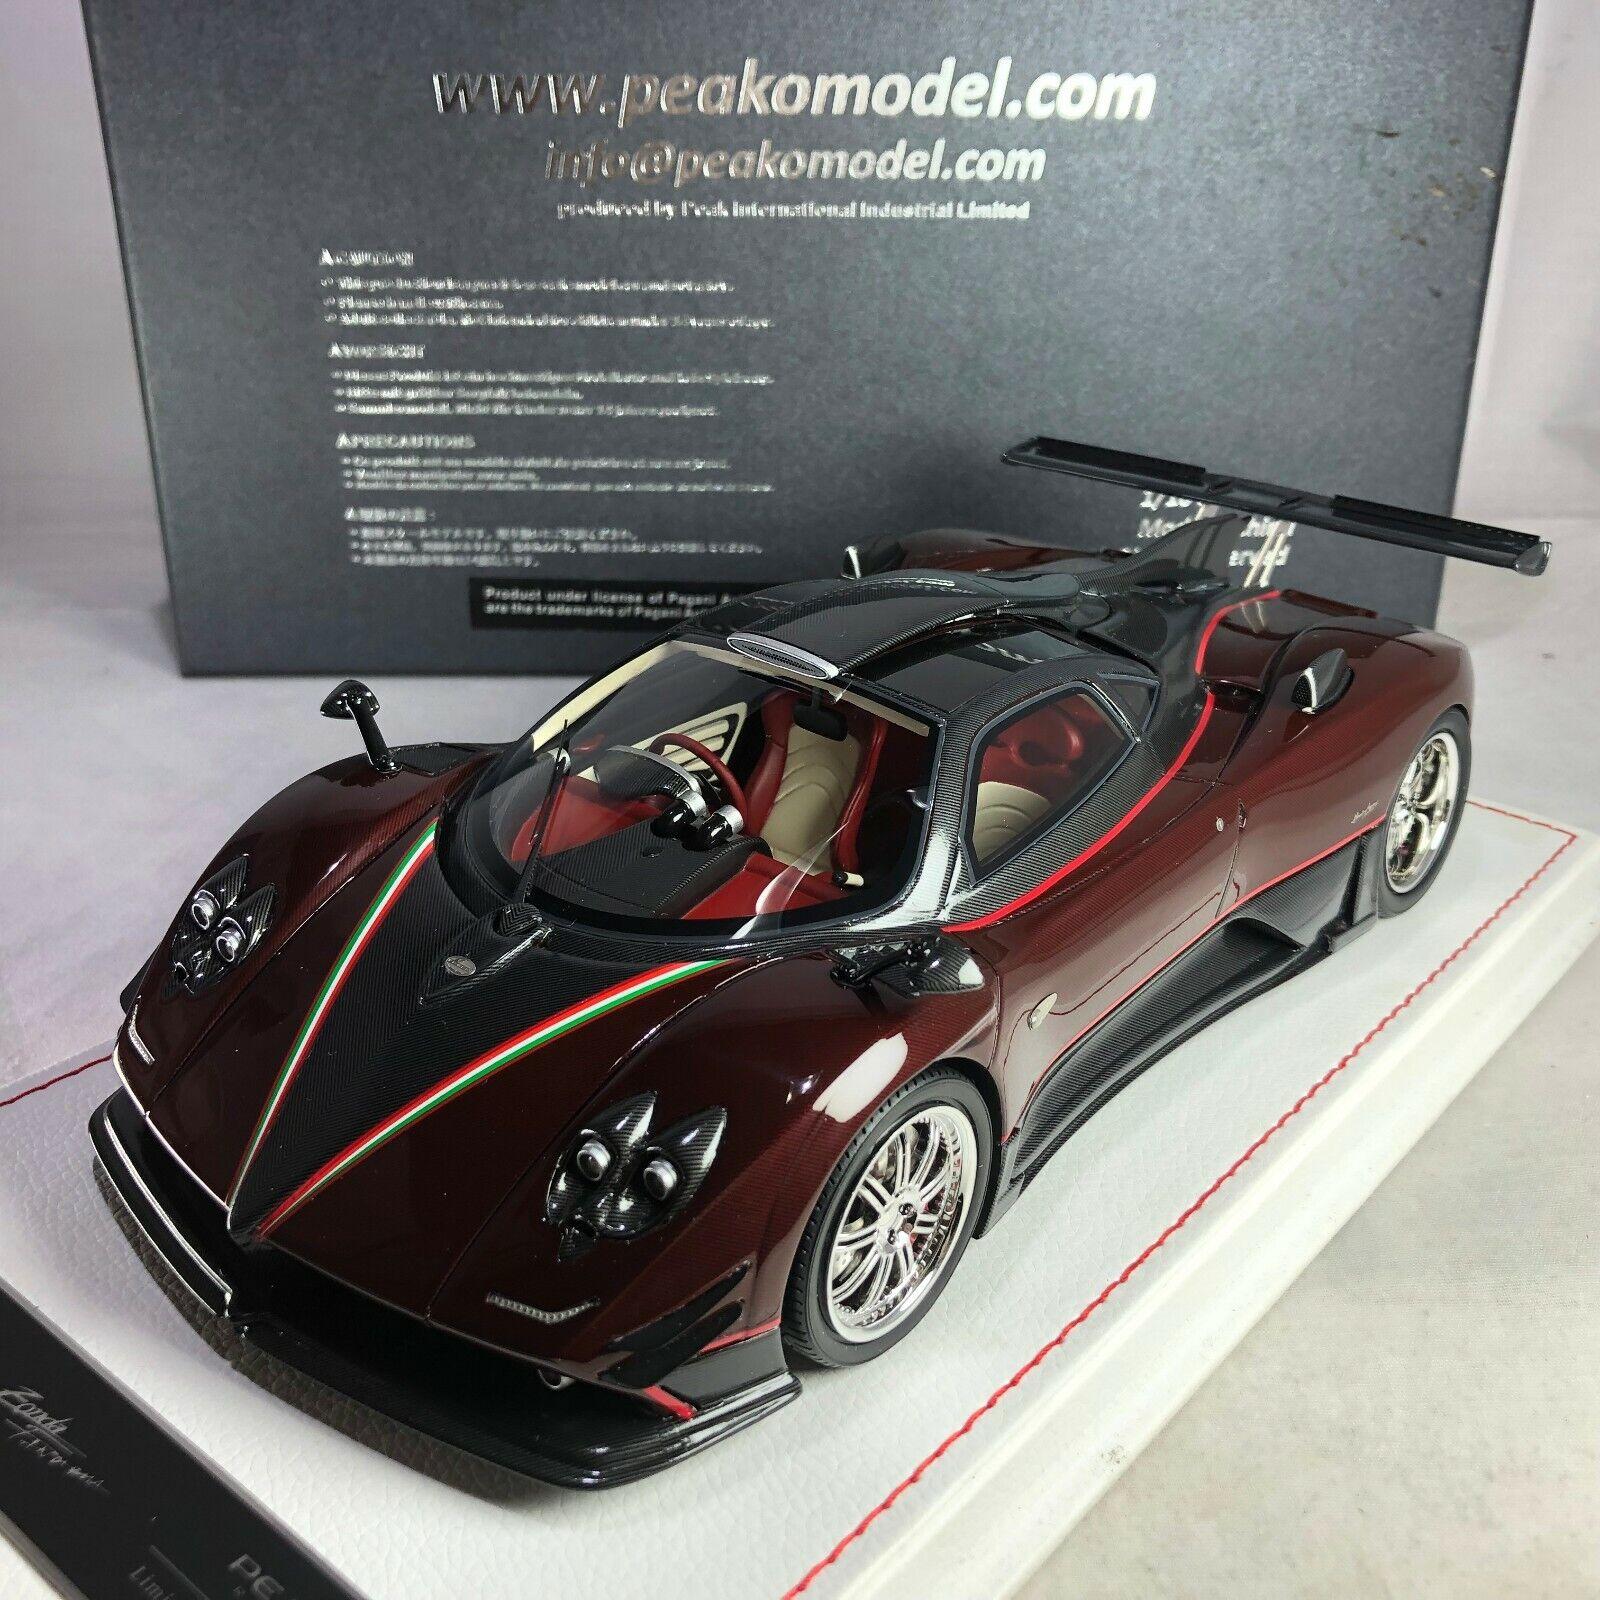 1/18 Peako Pagani Zonda 760 Fantasma Red Carbon Ltd 03 / 50 pcs 81500